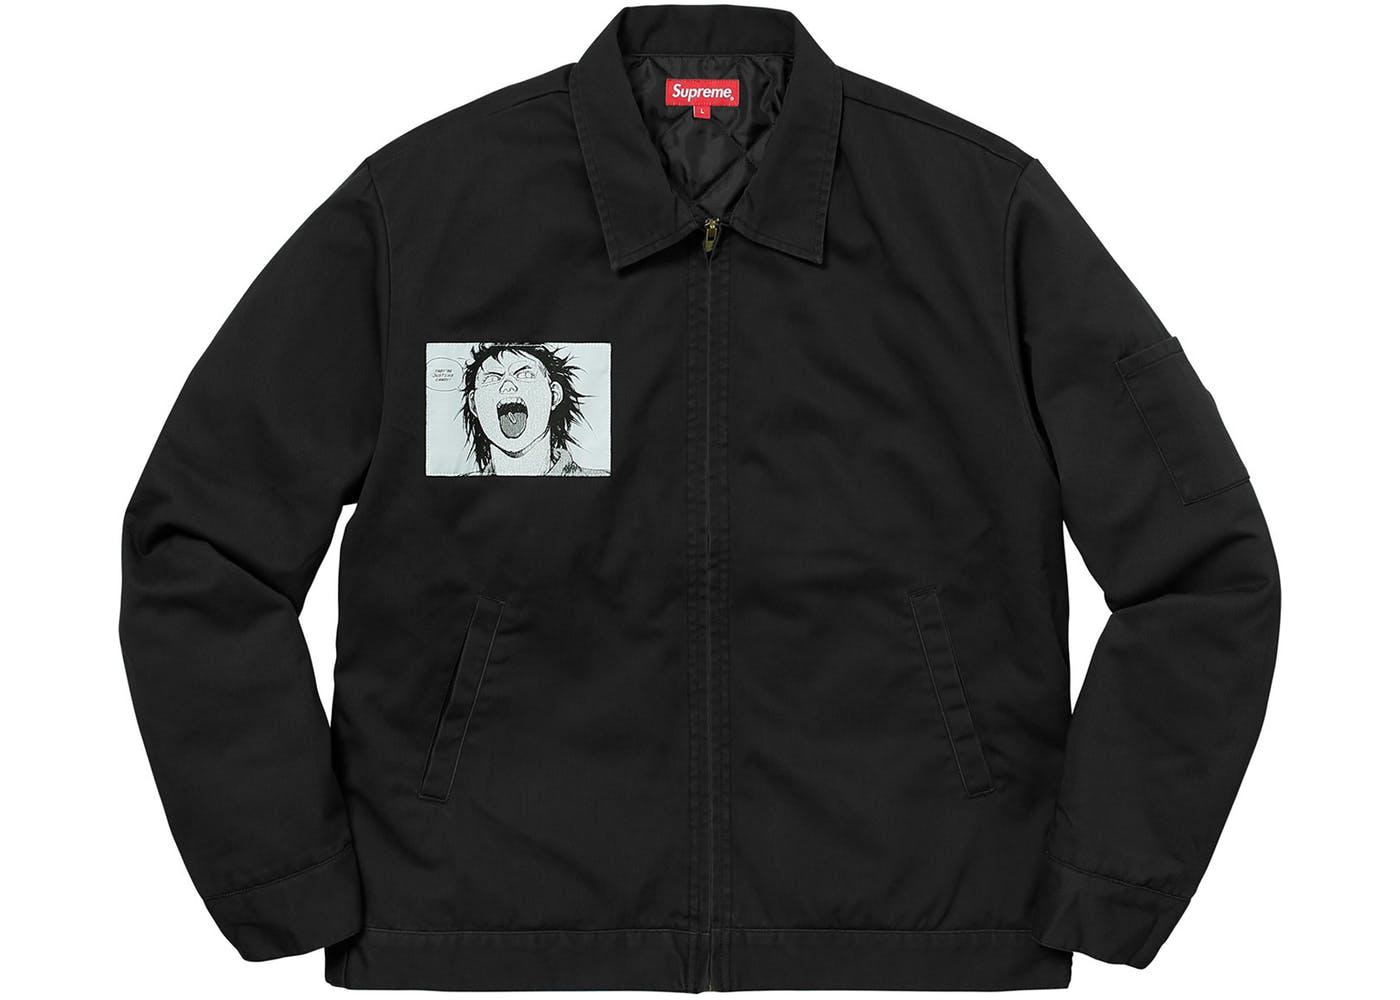 Black Supreme AKIRA Work Jacket - StockX News